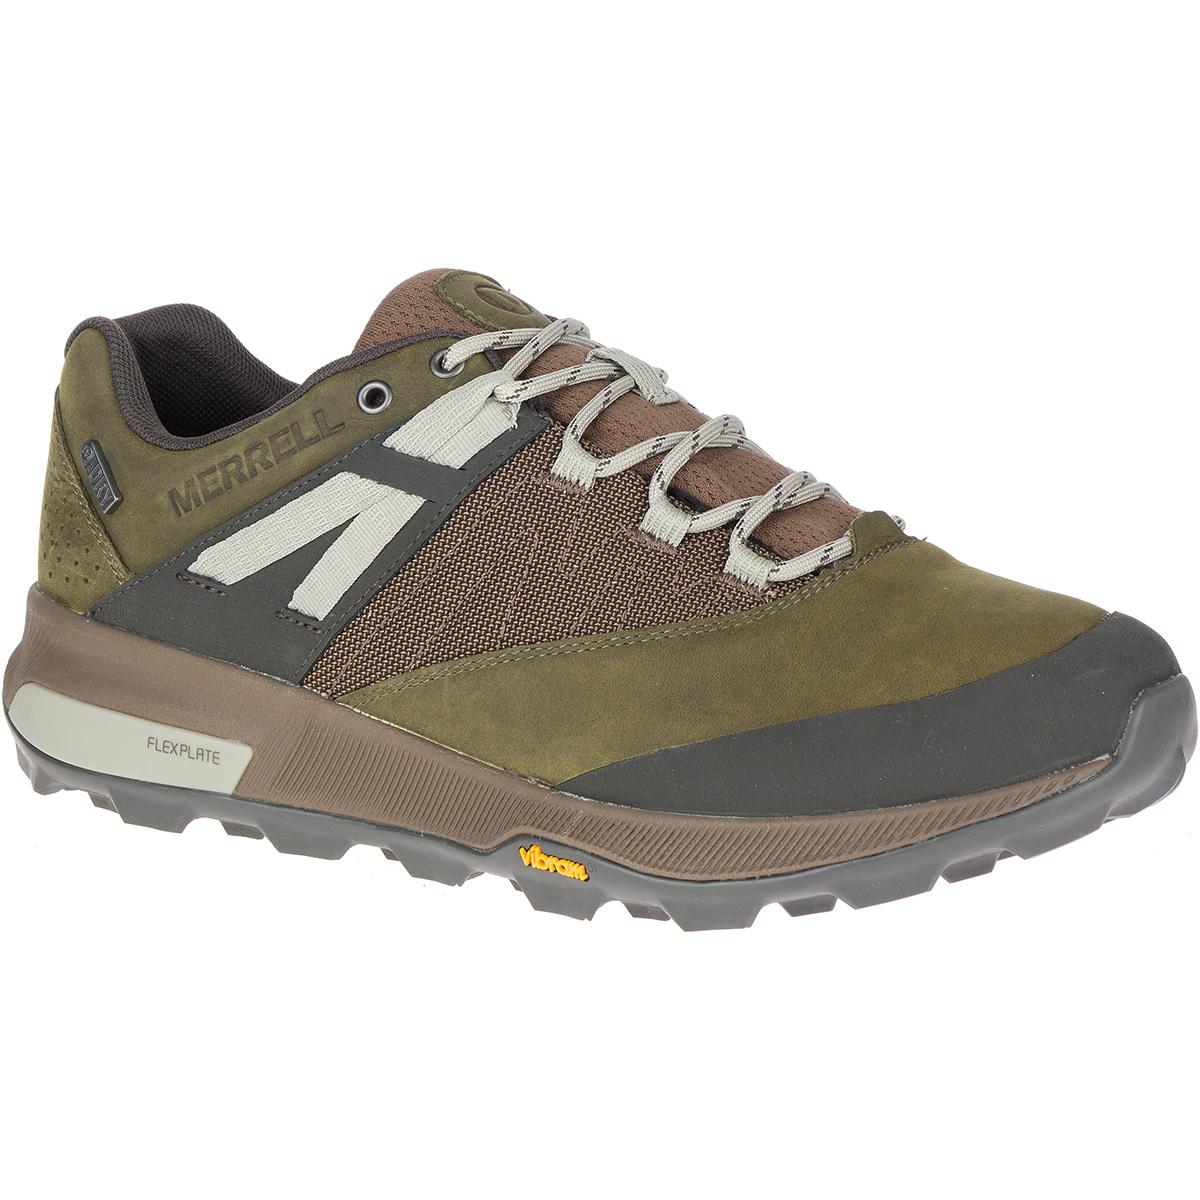 Merrell Men's Zion Waterproof Hiking Shoe - Green, 10.5